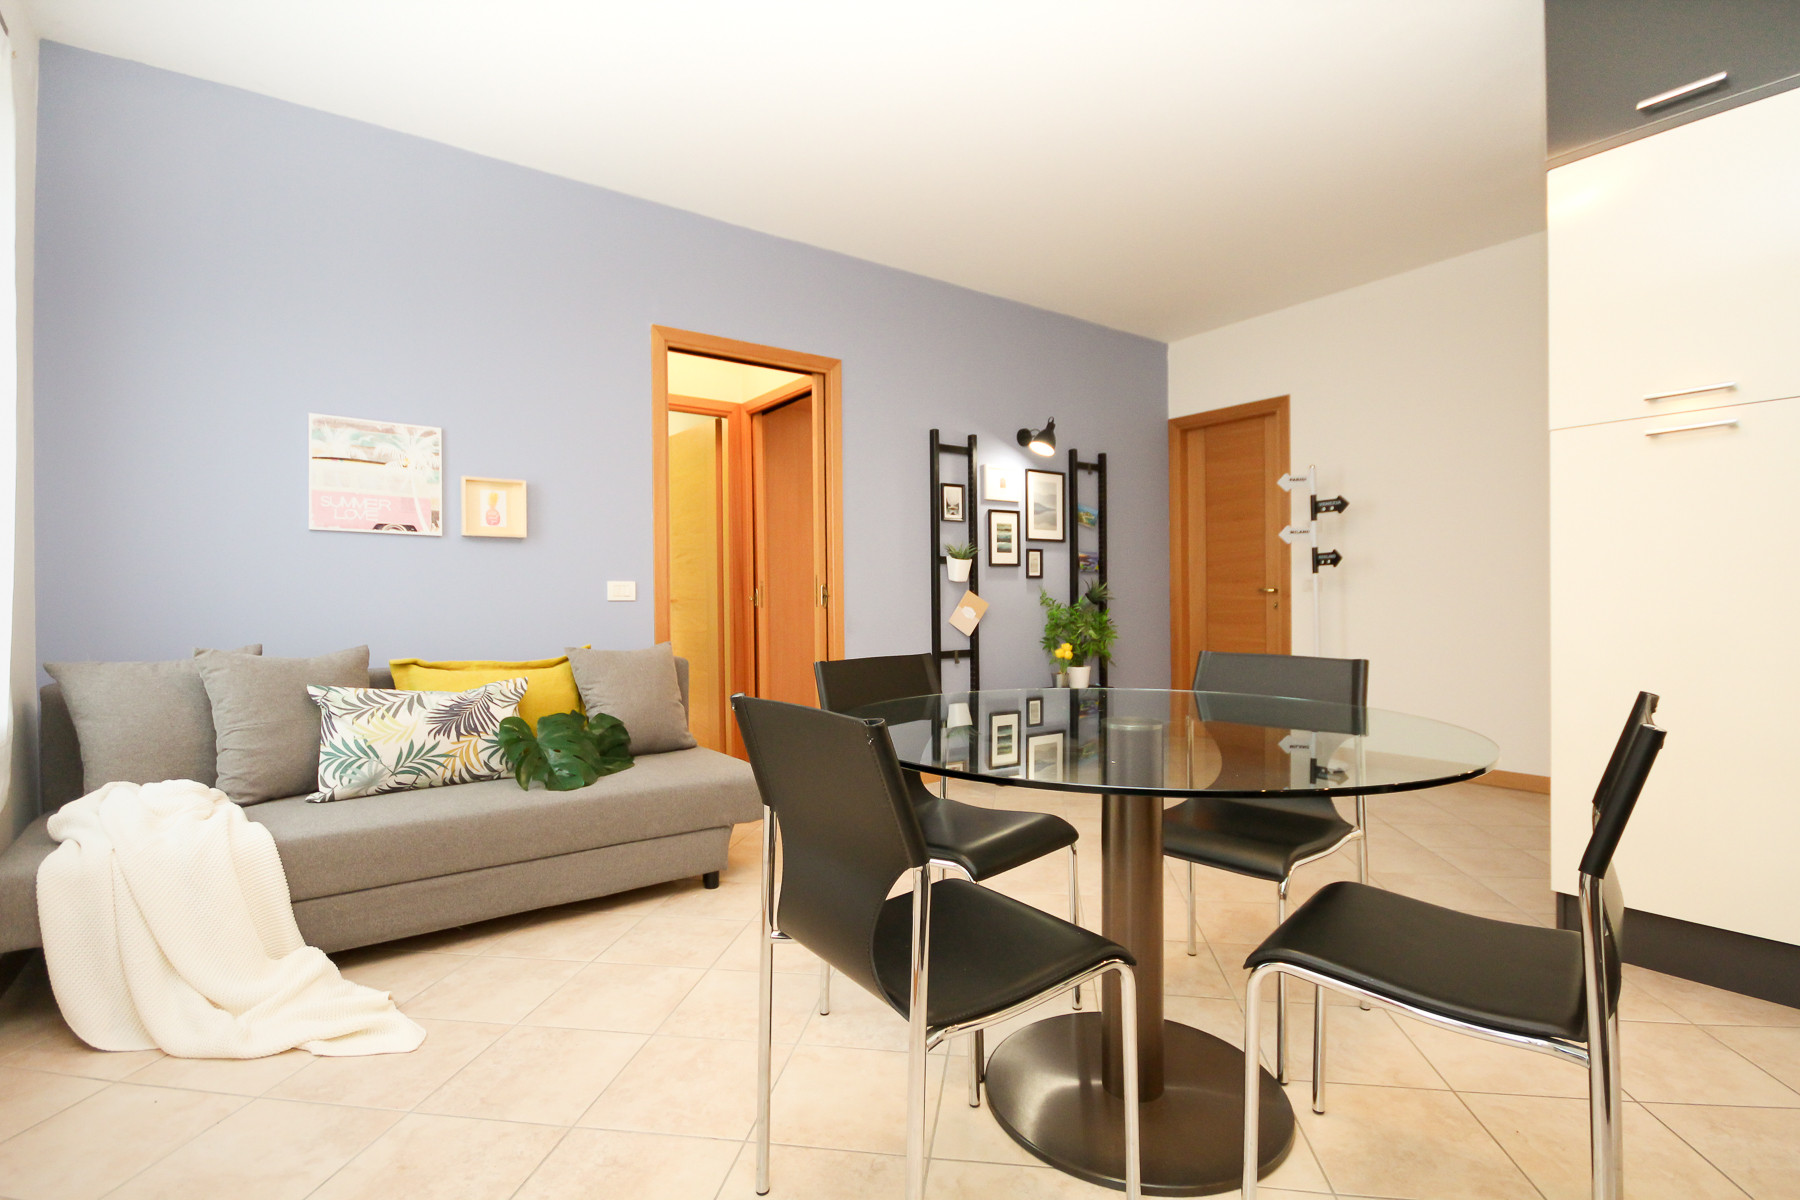 Appartamenti in Padova - Yourbanflat Trieste